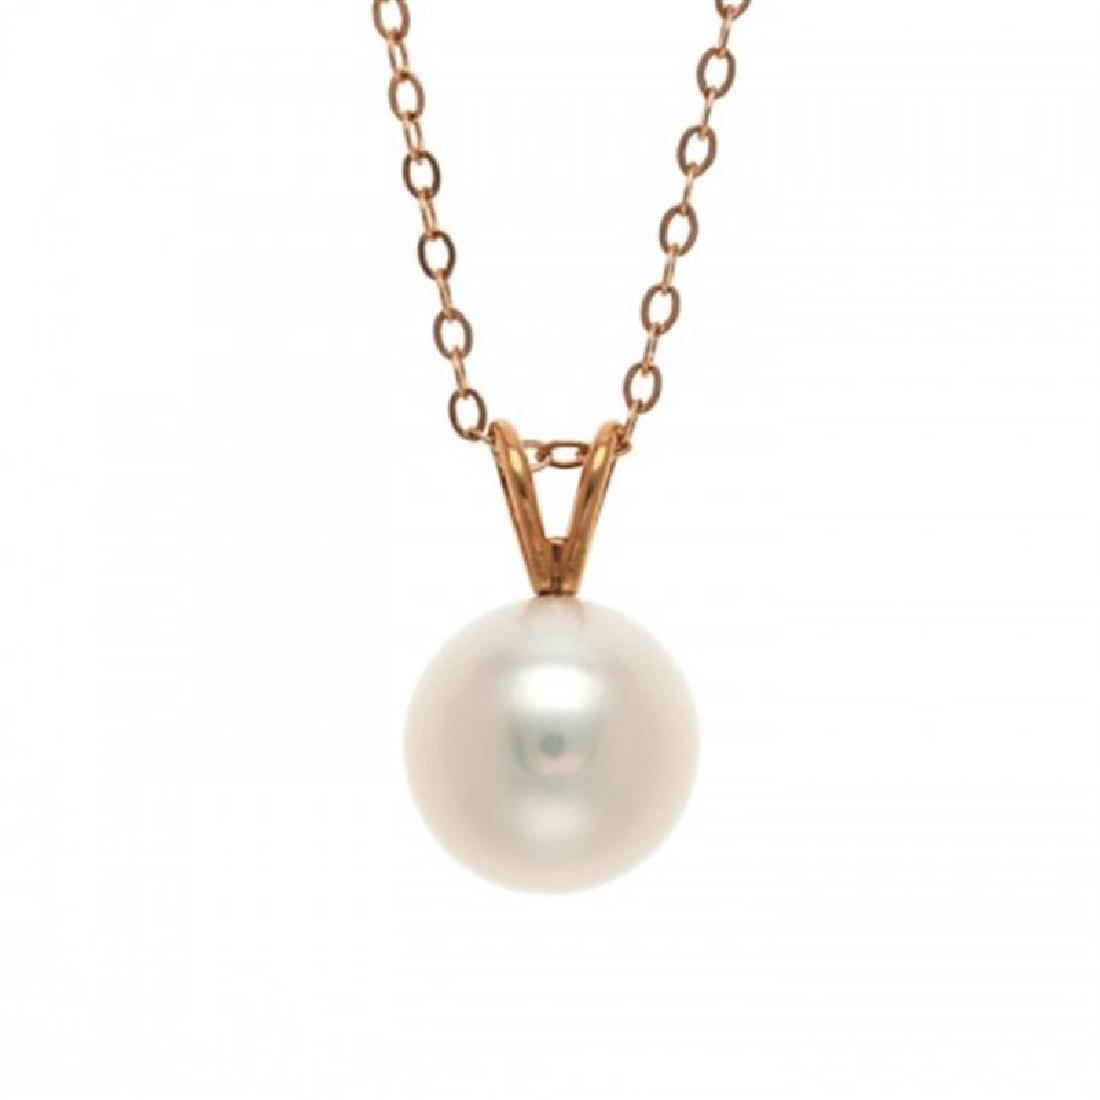 10.0-10.5mm Freshwater Pearl Pendant